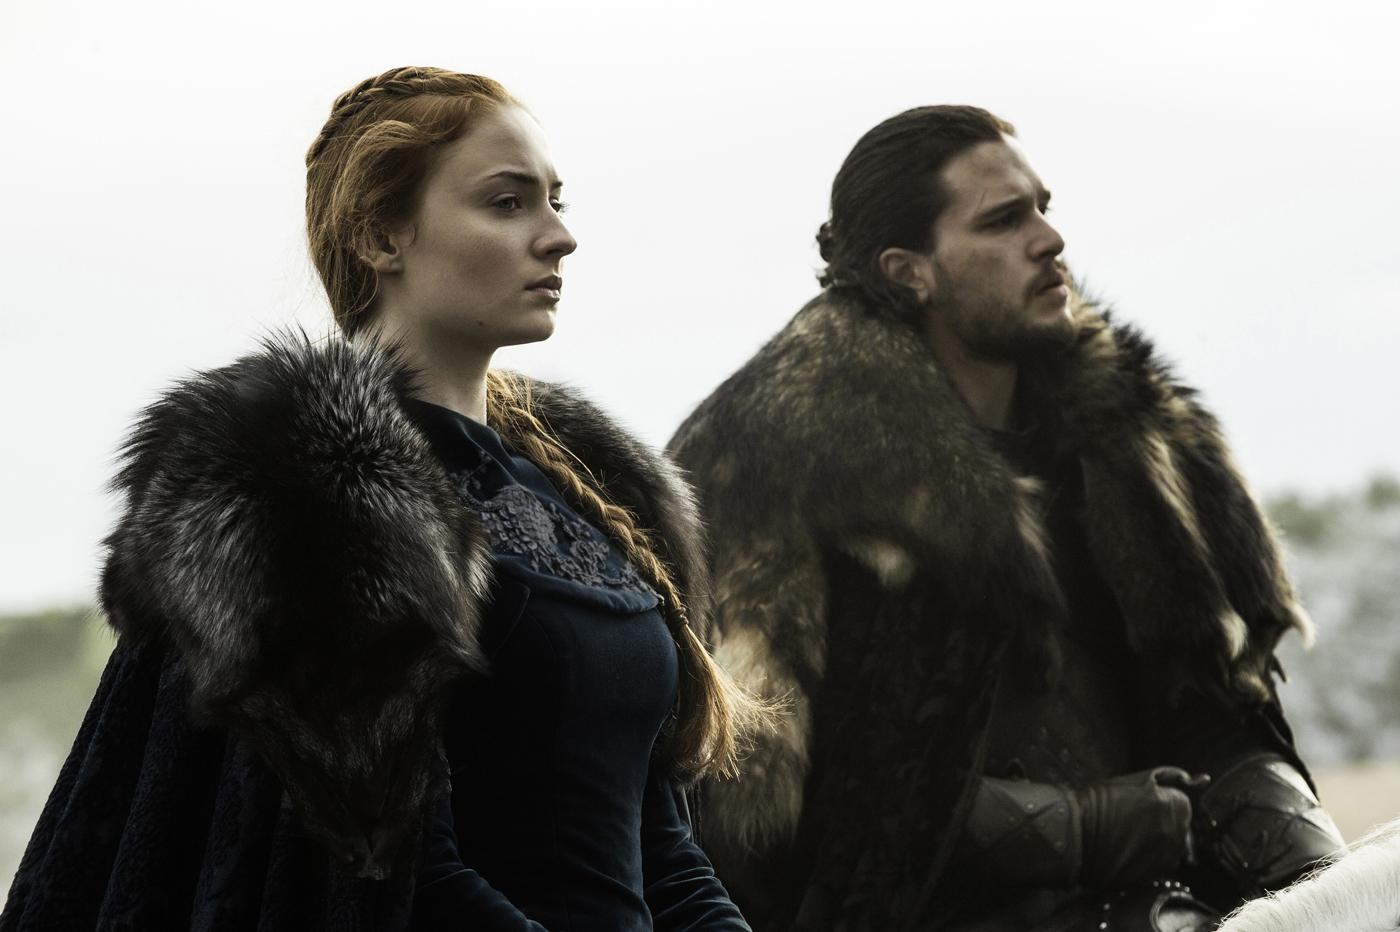 Game of Thrones Recap: Season 6, Episode 9, Battle of the Bastards